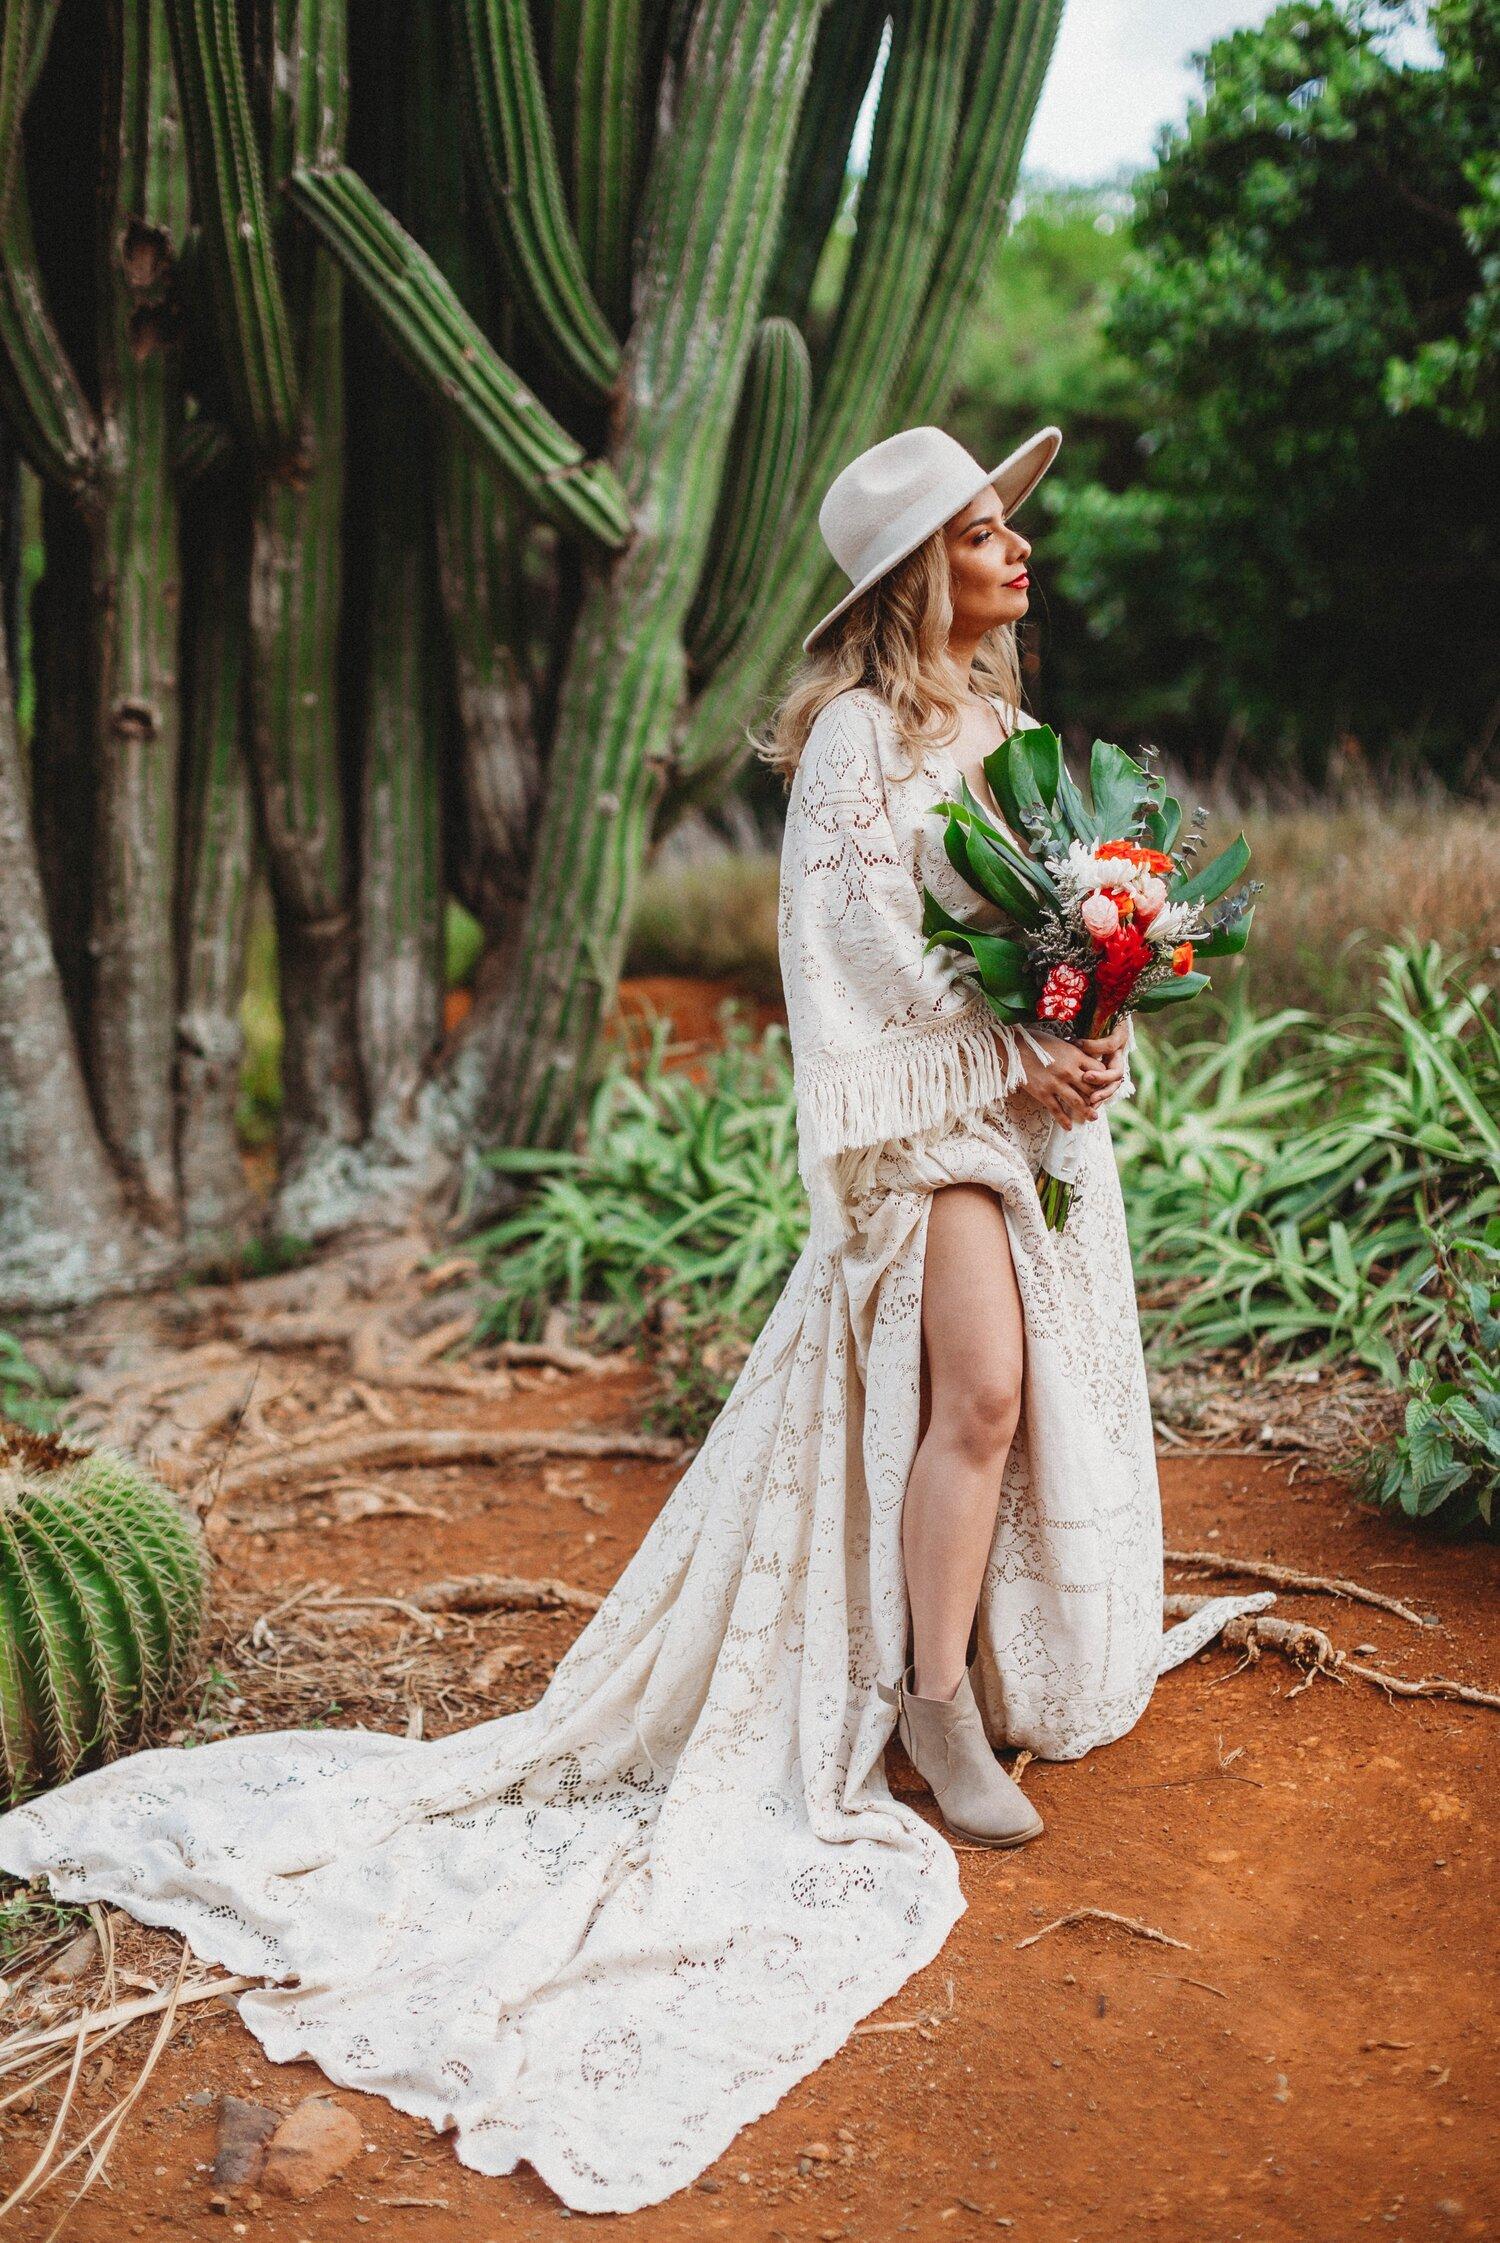 Boho Cactus Elopement - Honolulu, Koko Crater Botanical Garden - Oahu Hawaii Wedding Photographer 30.jpg